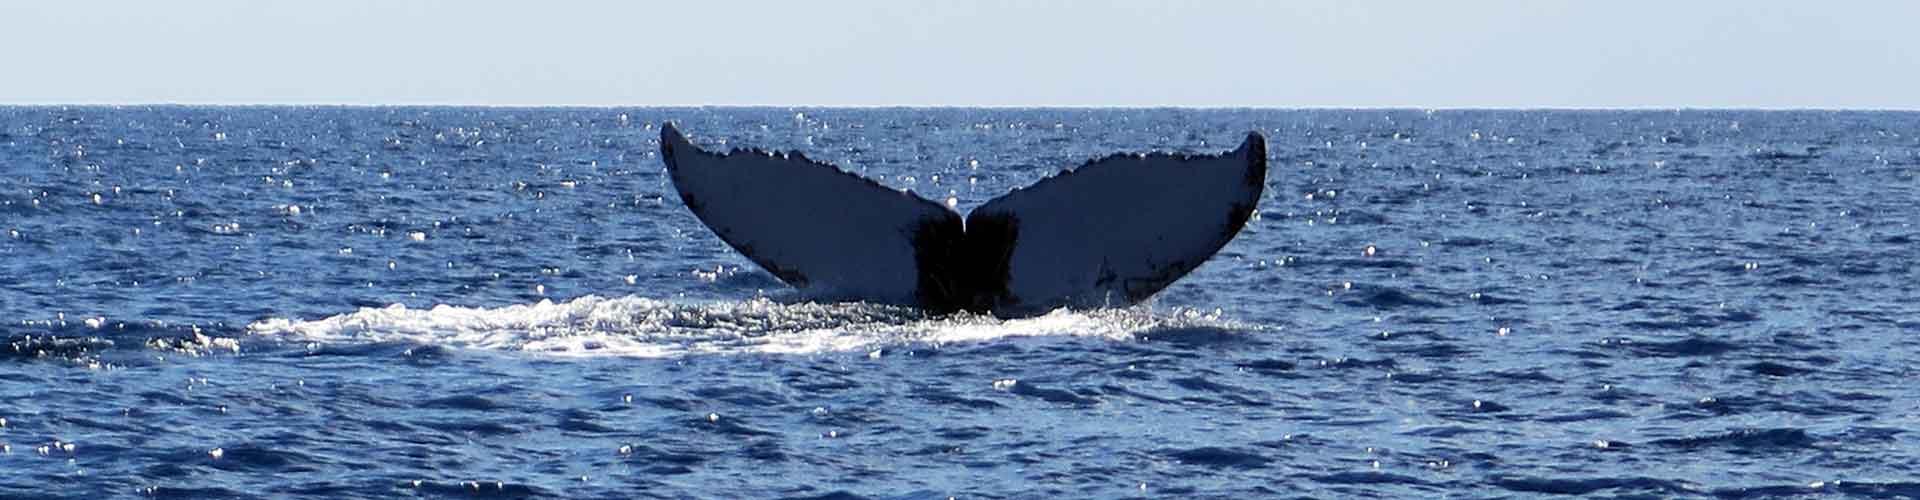 Manta Diving - Biologia marina - Megattere